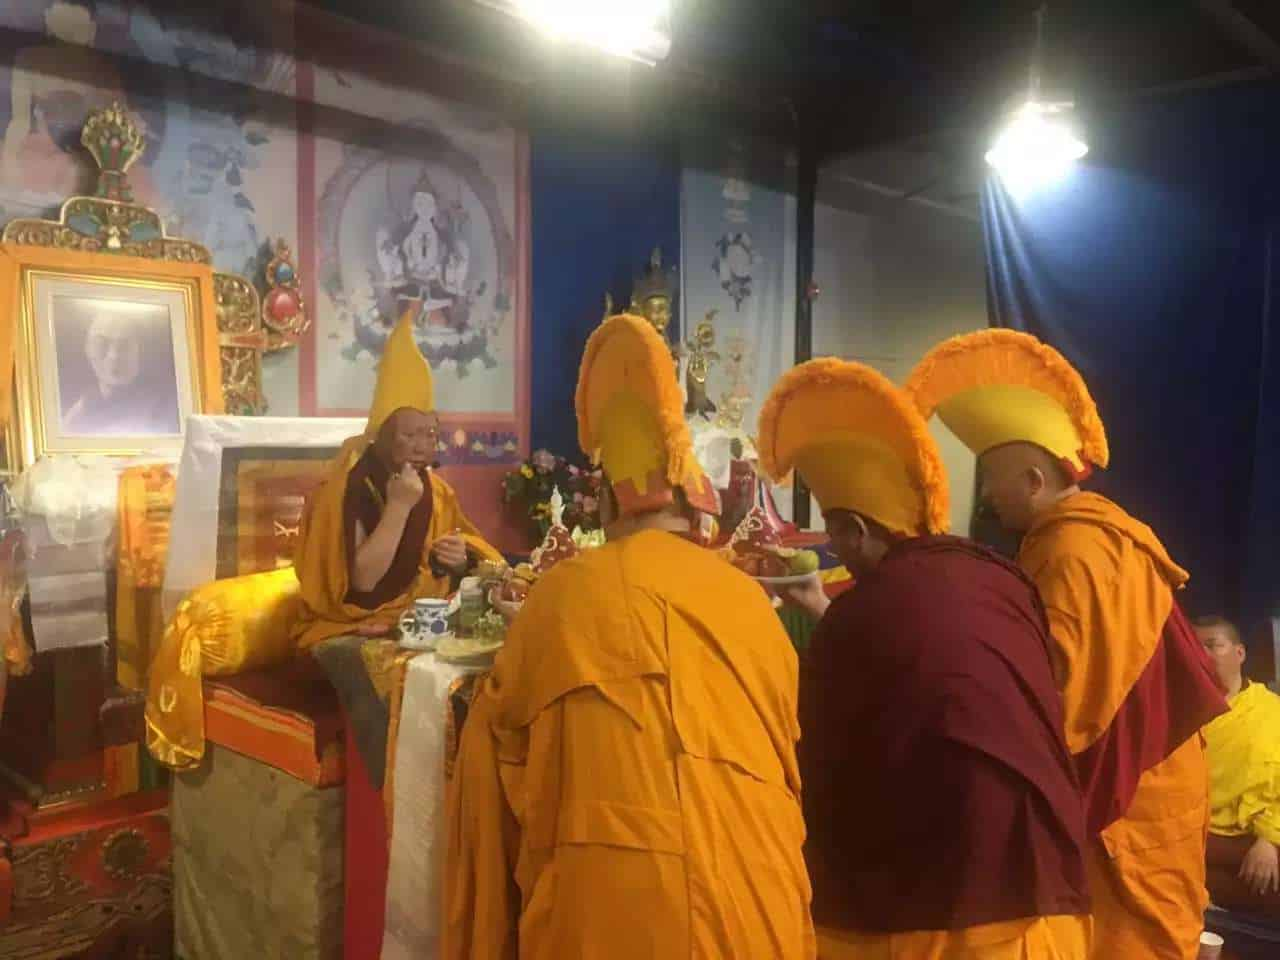 gosok-rinpoche-toronto-2016-746b76f67af566eb333fbc99df3364d